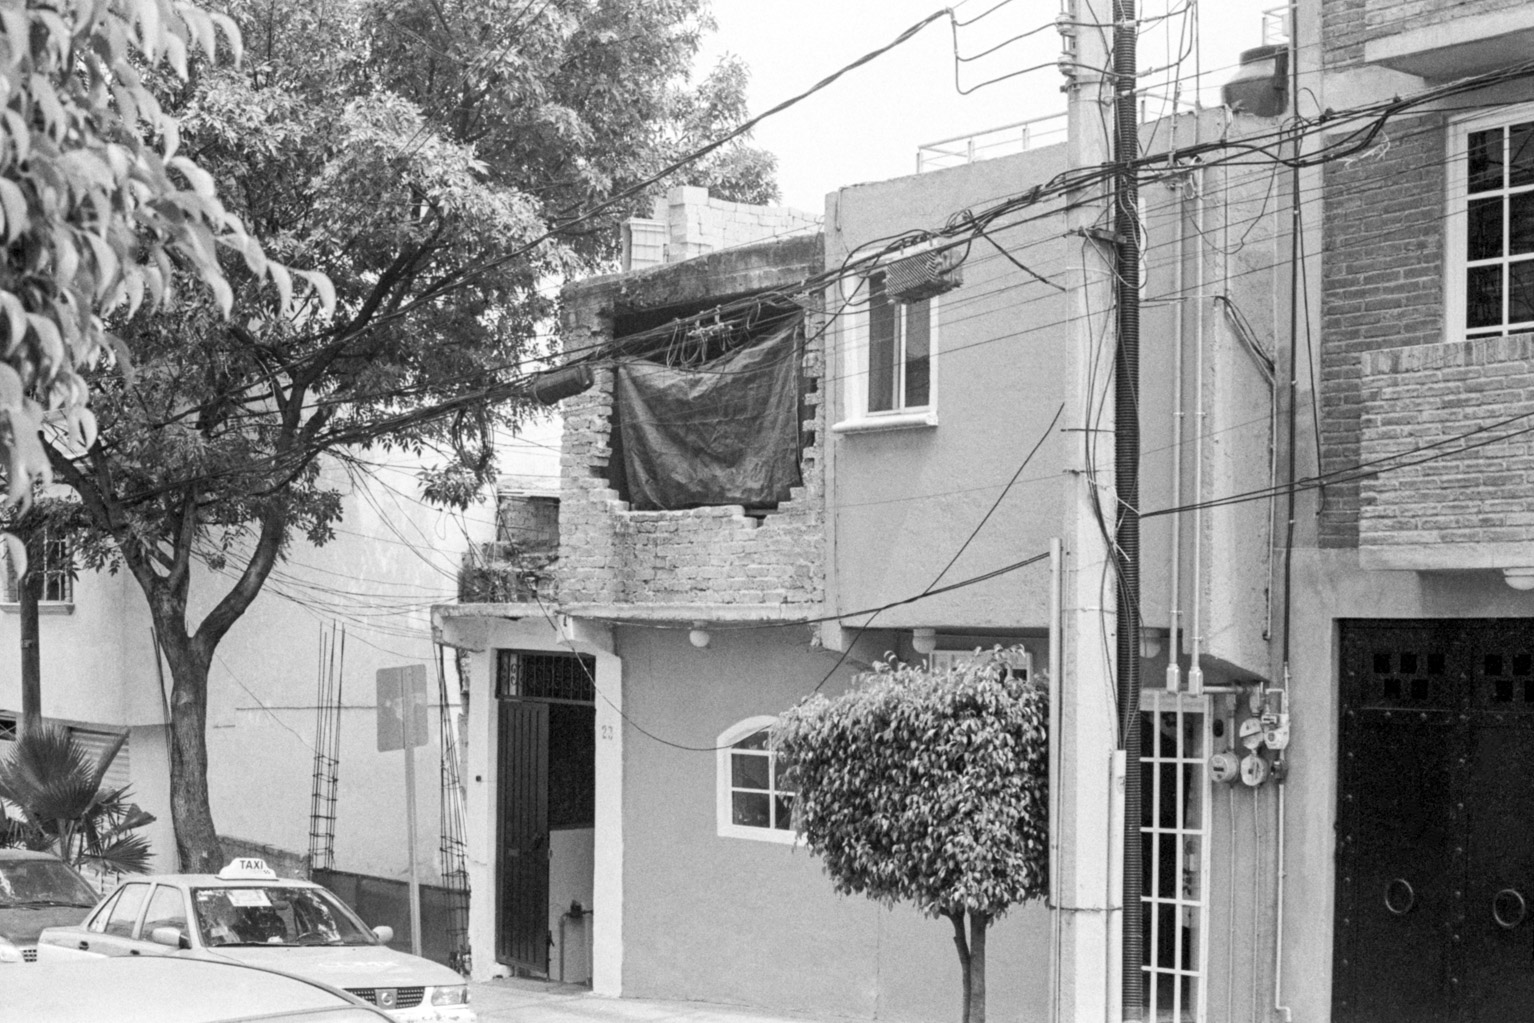 20190523_MexicoCIty_M5-KodakTrix400_014-Edit.jpg